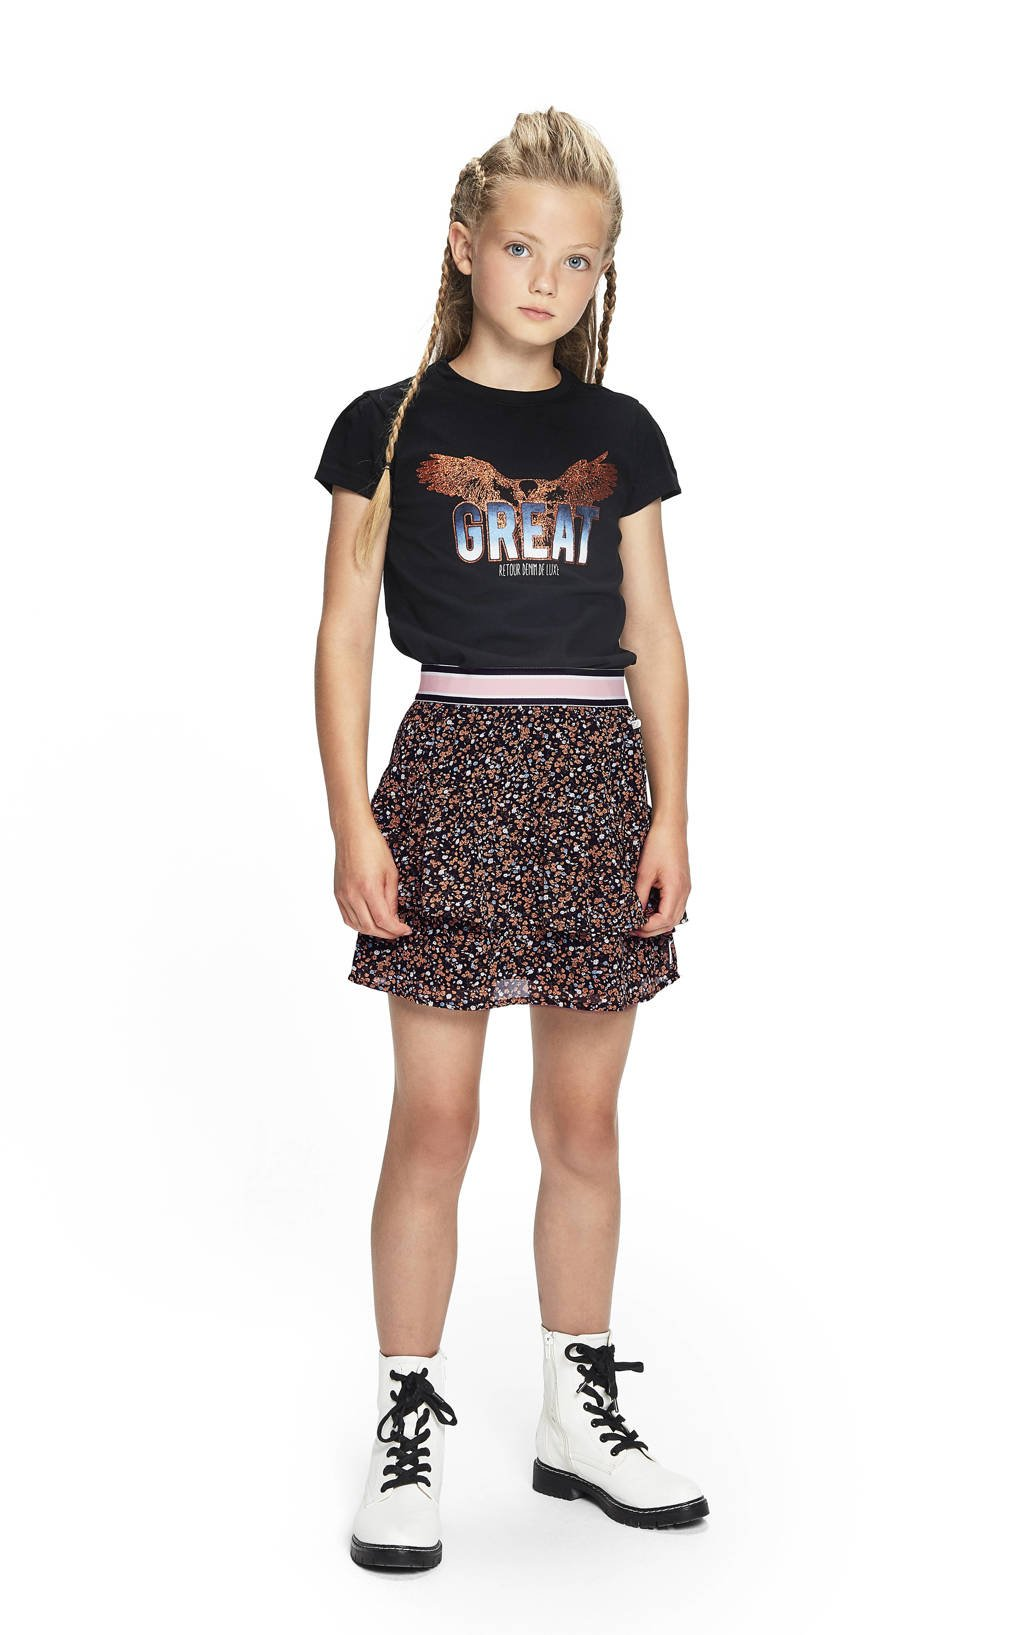 Retour Denim gebloemde rok Ellen zwart/lichtbruin, Zwart/lichtbruin